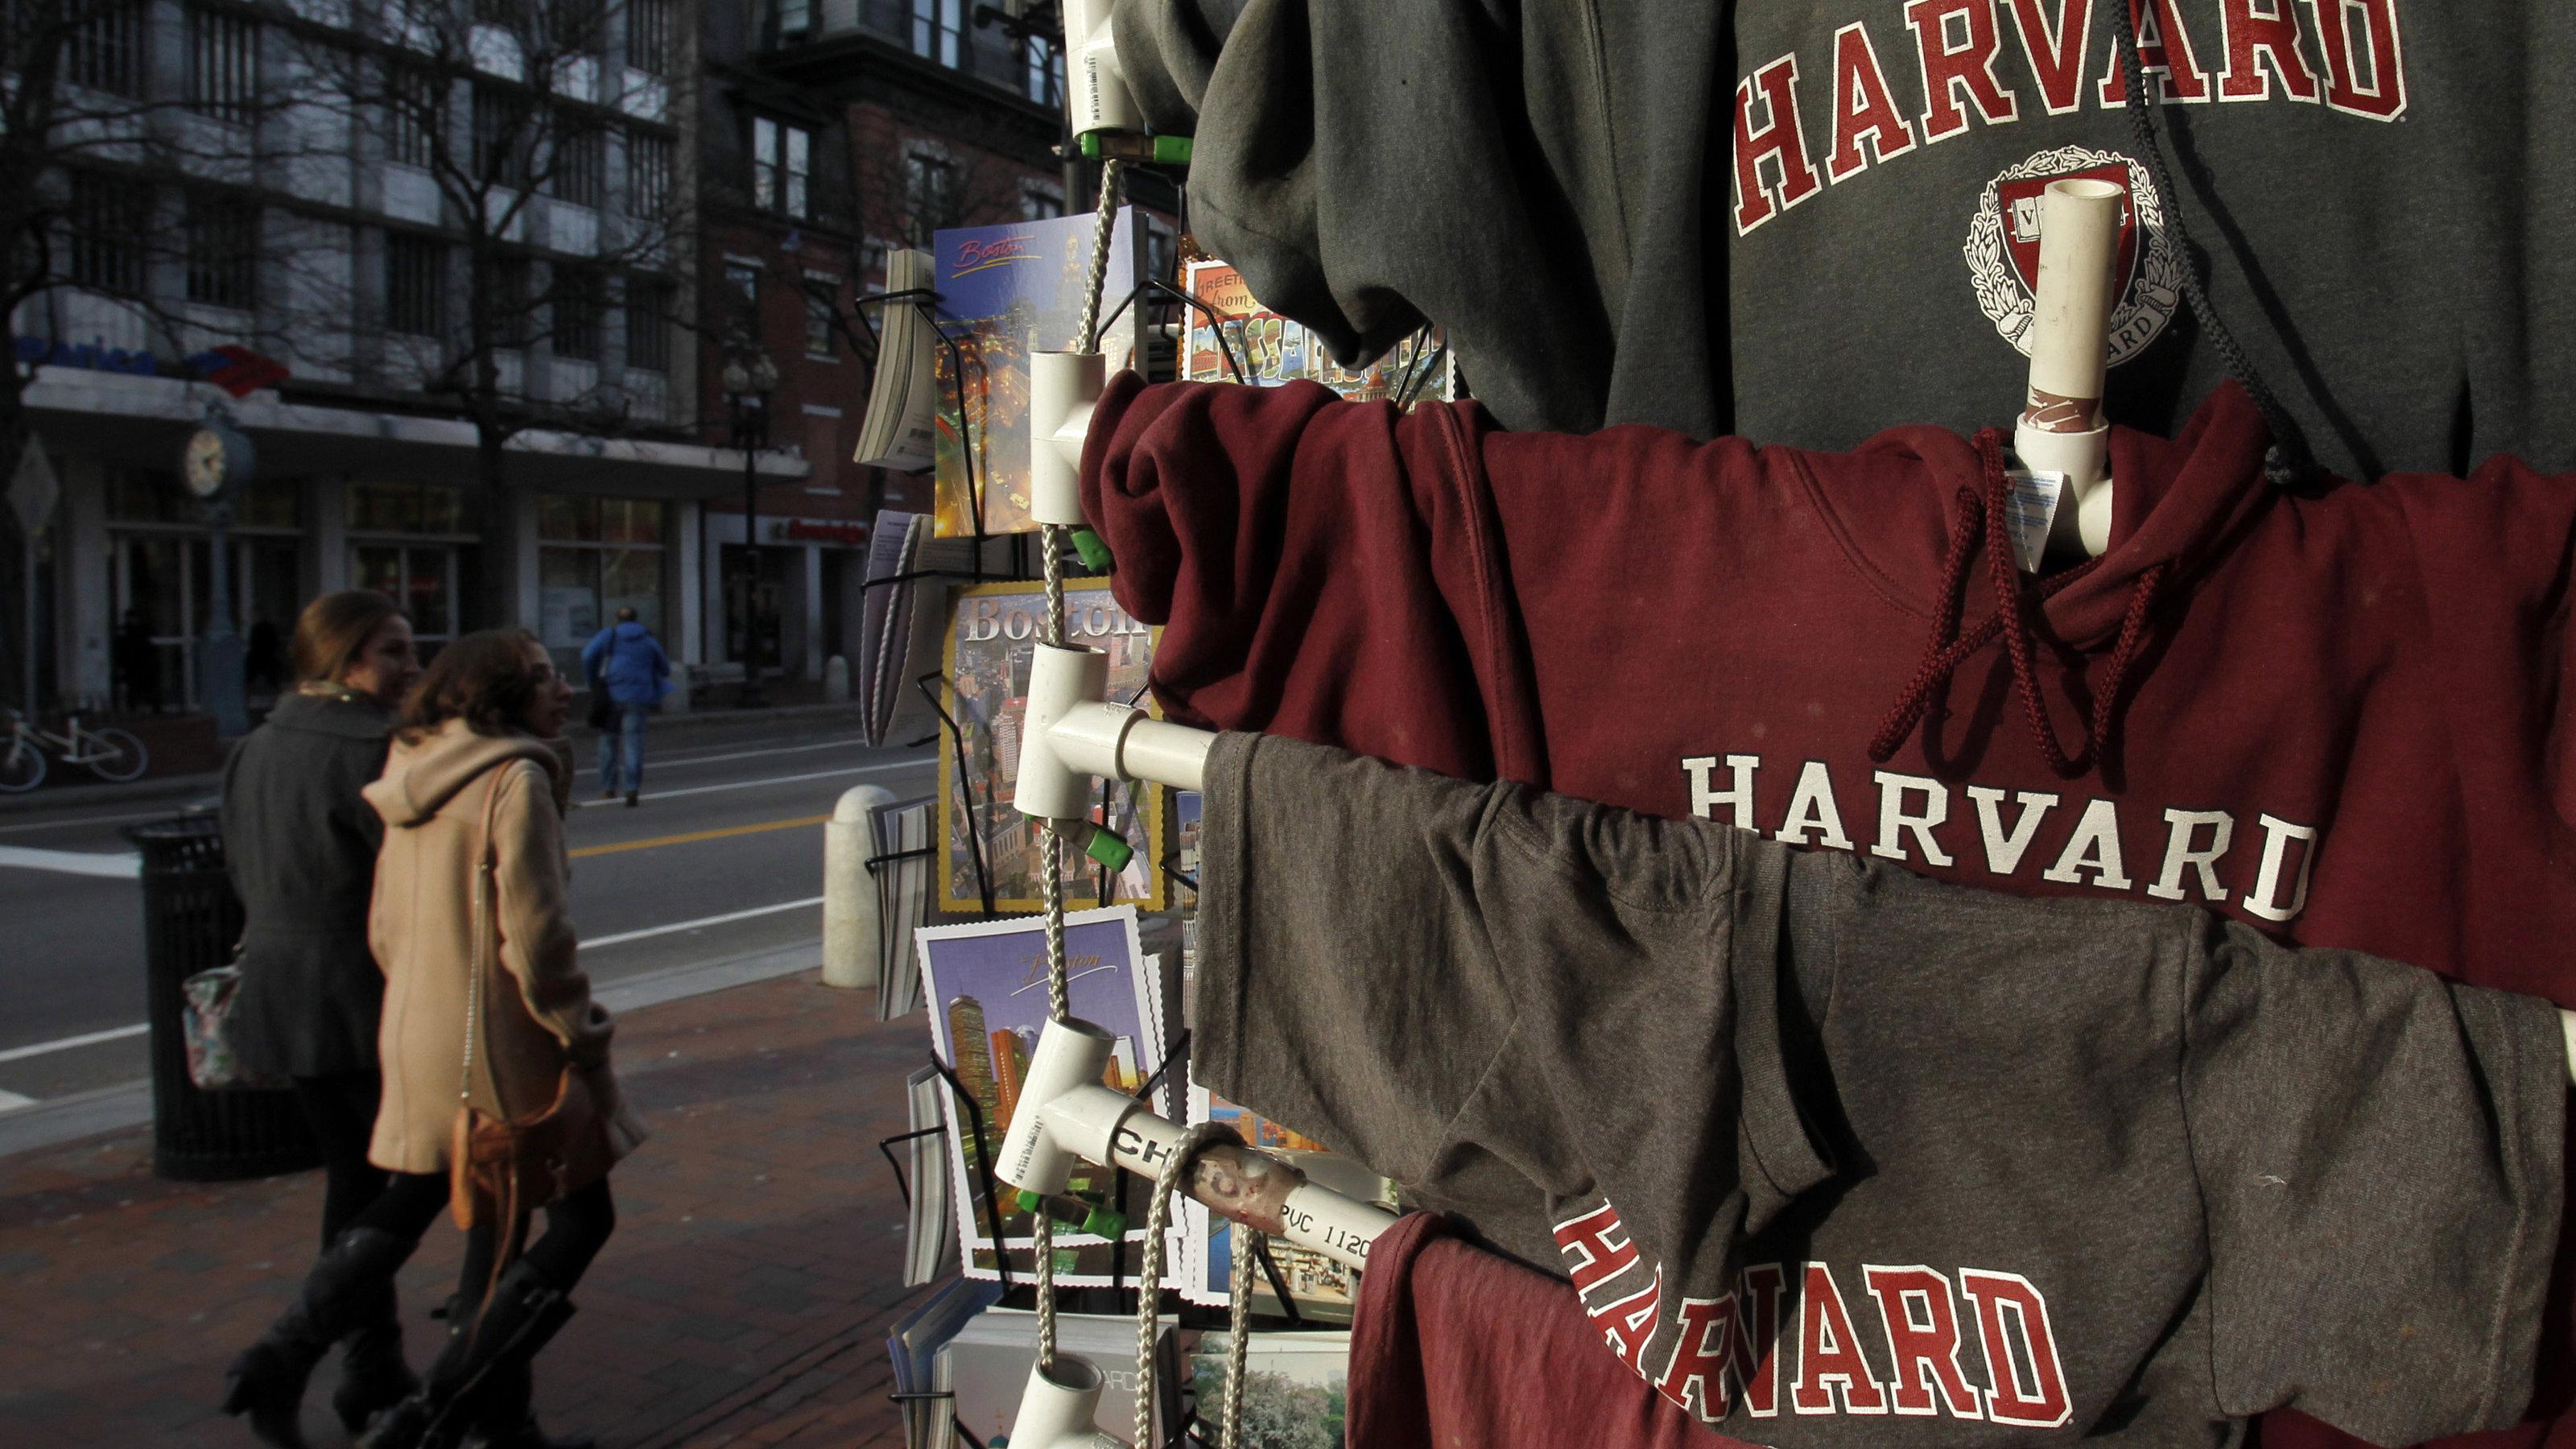 Harvard shirts